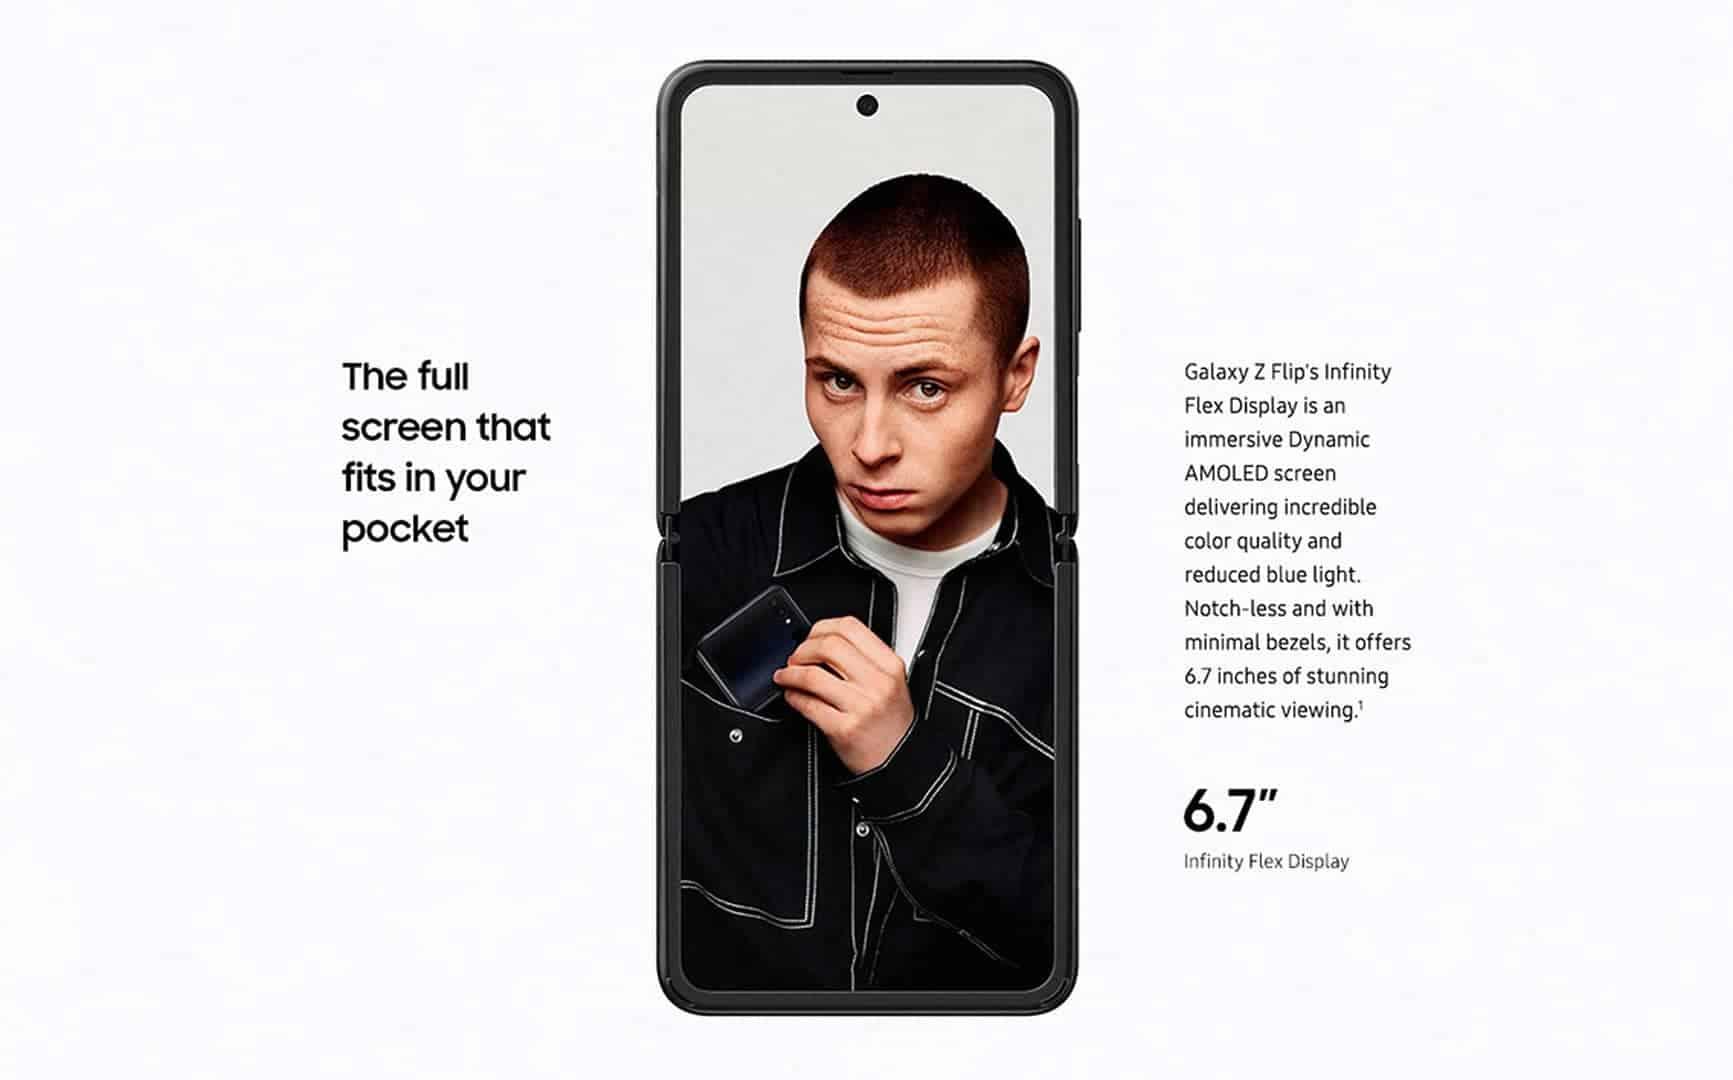 Samsung Galaxy Z Flip marketing image 8